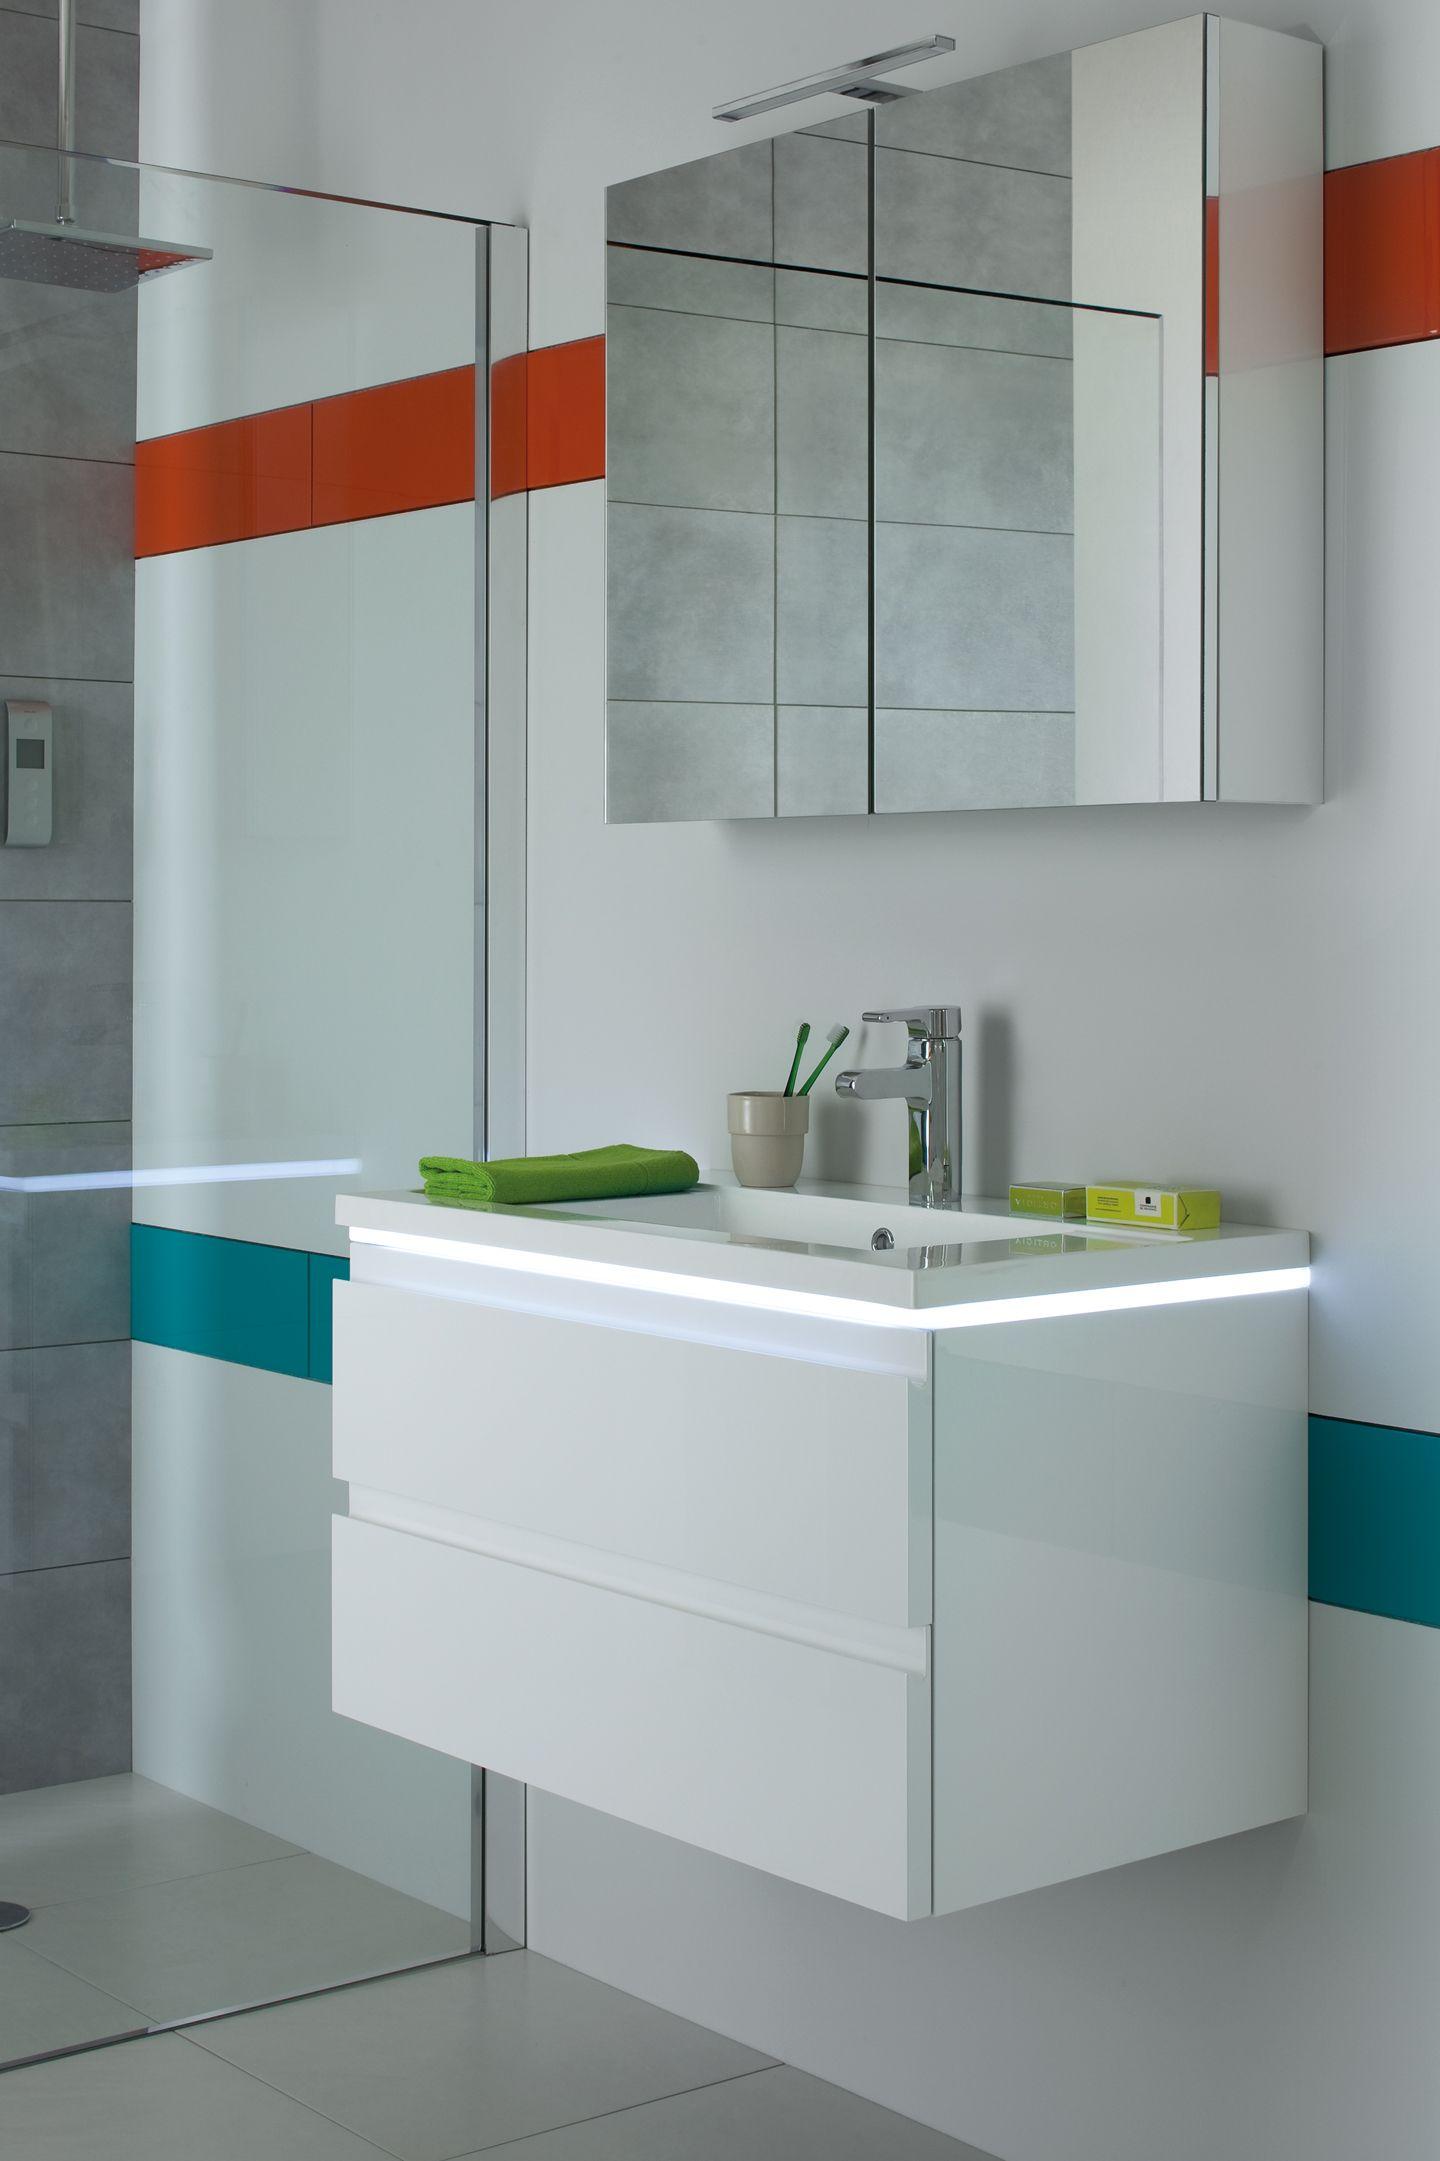 Blanc White Salledebain Bathroom Halo Sanijura Lavabo Meubles